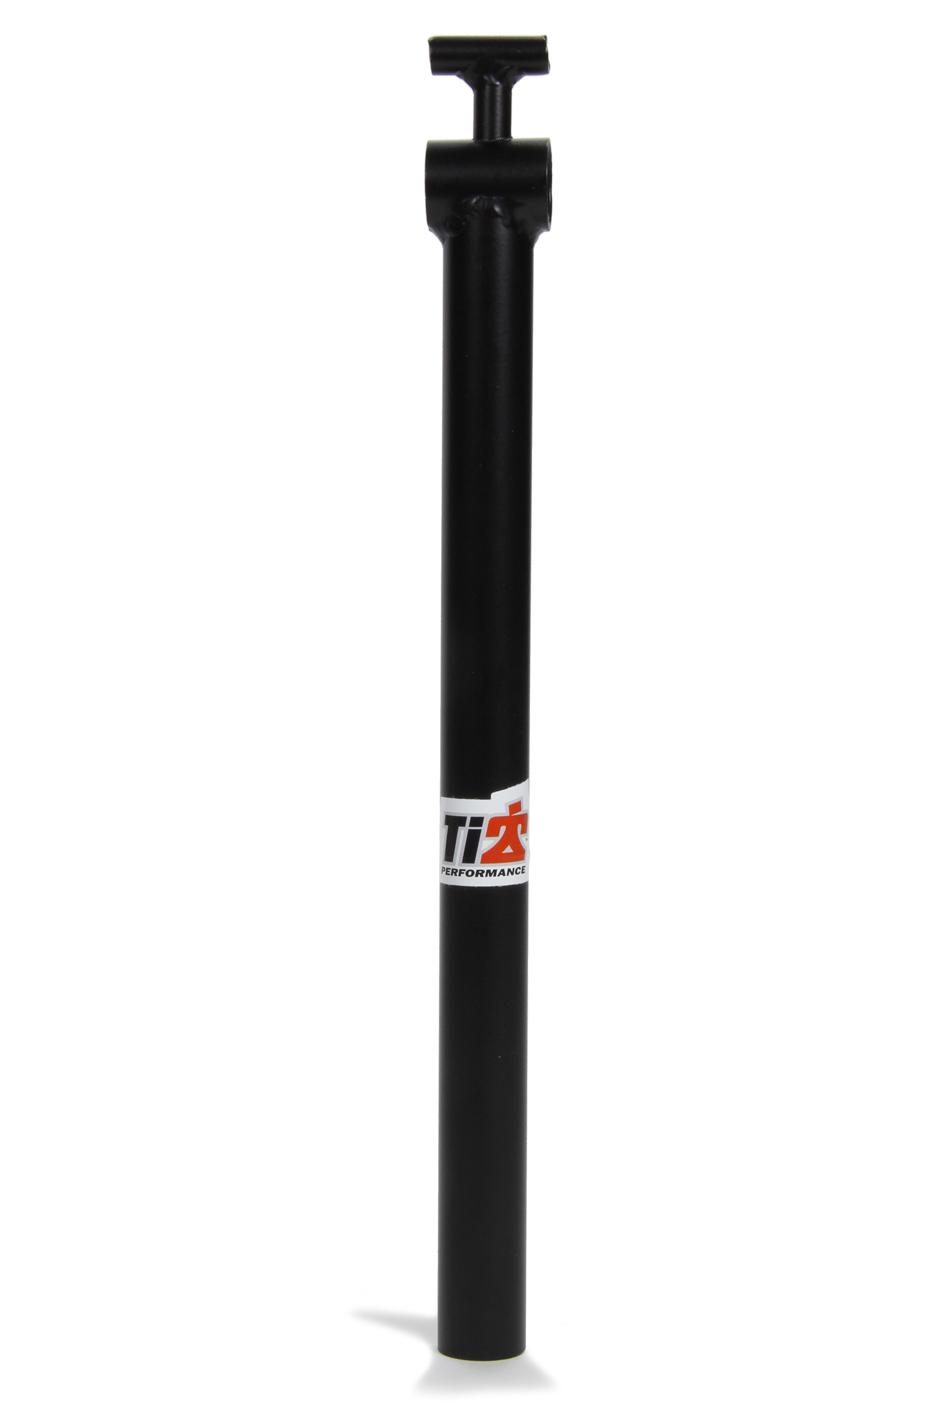 Ti22 PERFORMANCE 600 Top Wing Post Black 4130 P/N -TIP3761